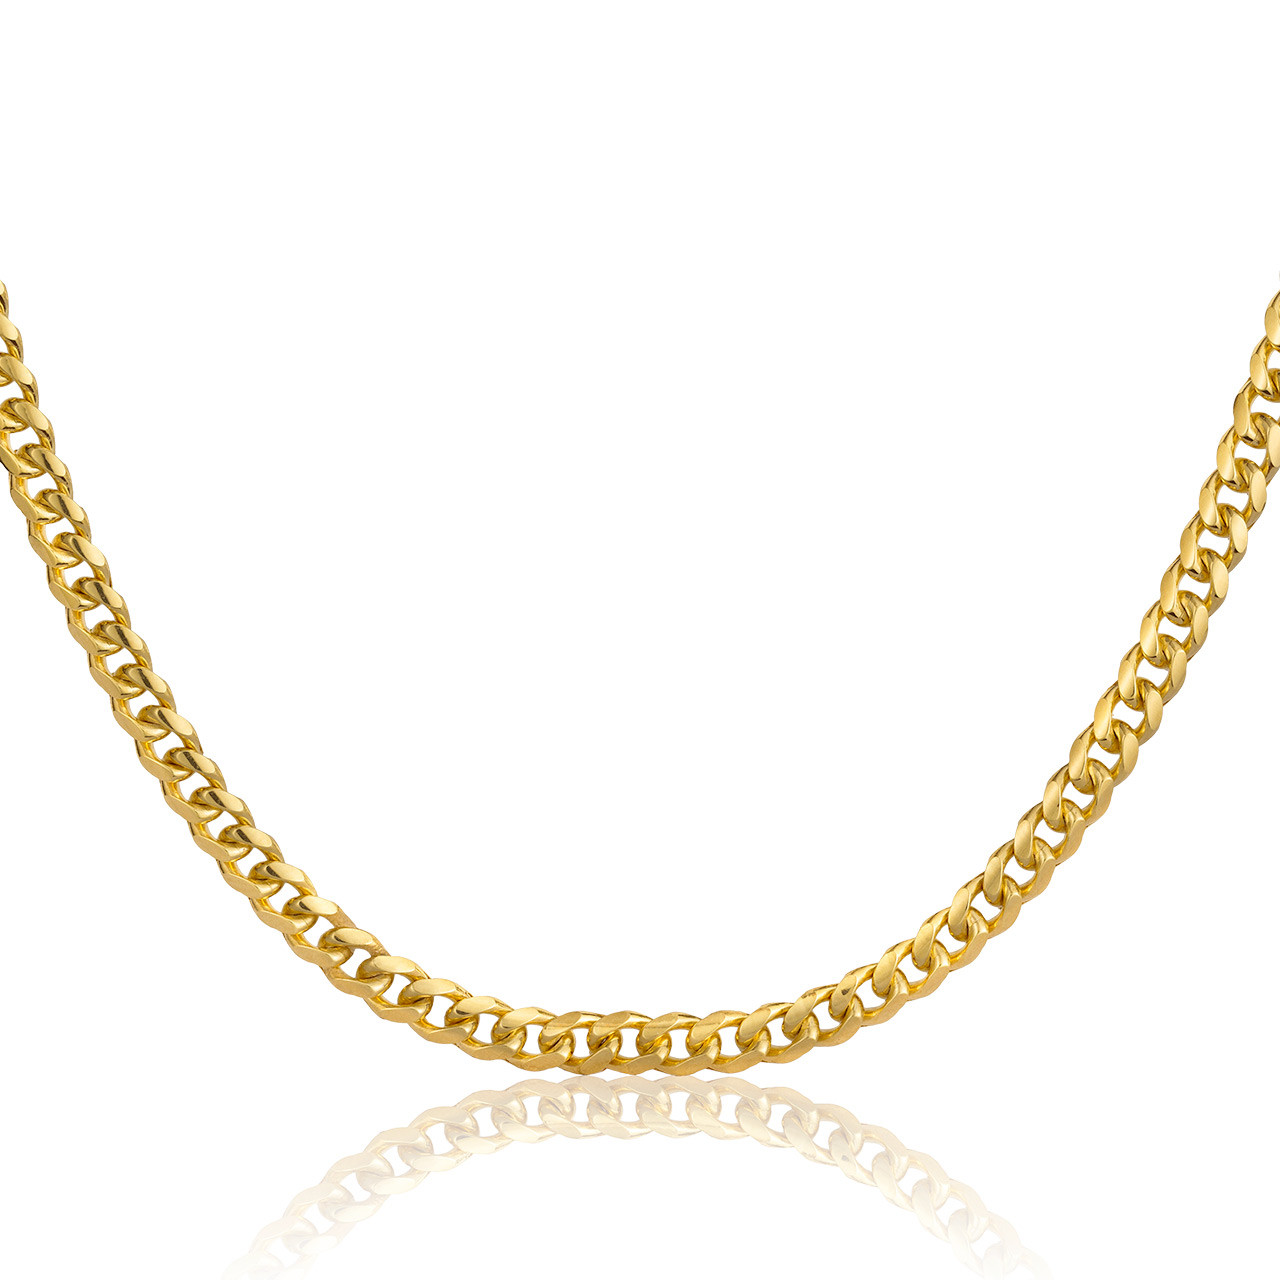 10k Gold Cuban Link Chain >> 10k Miami Cuban Link Chain 3 5mm